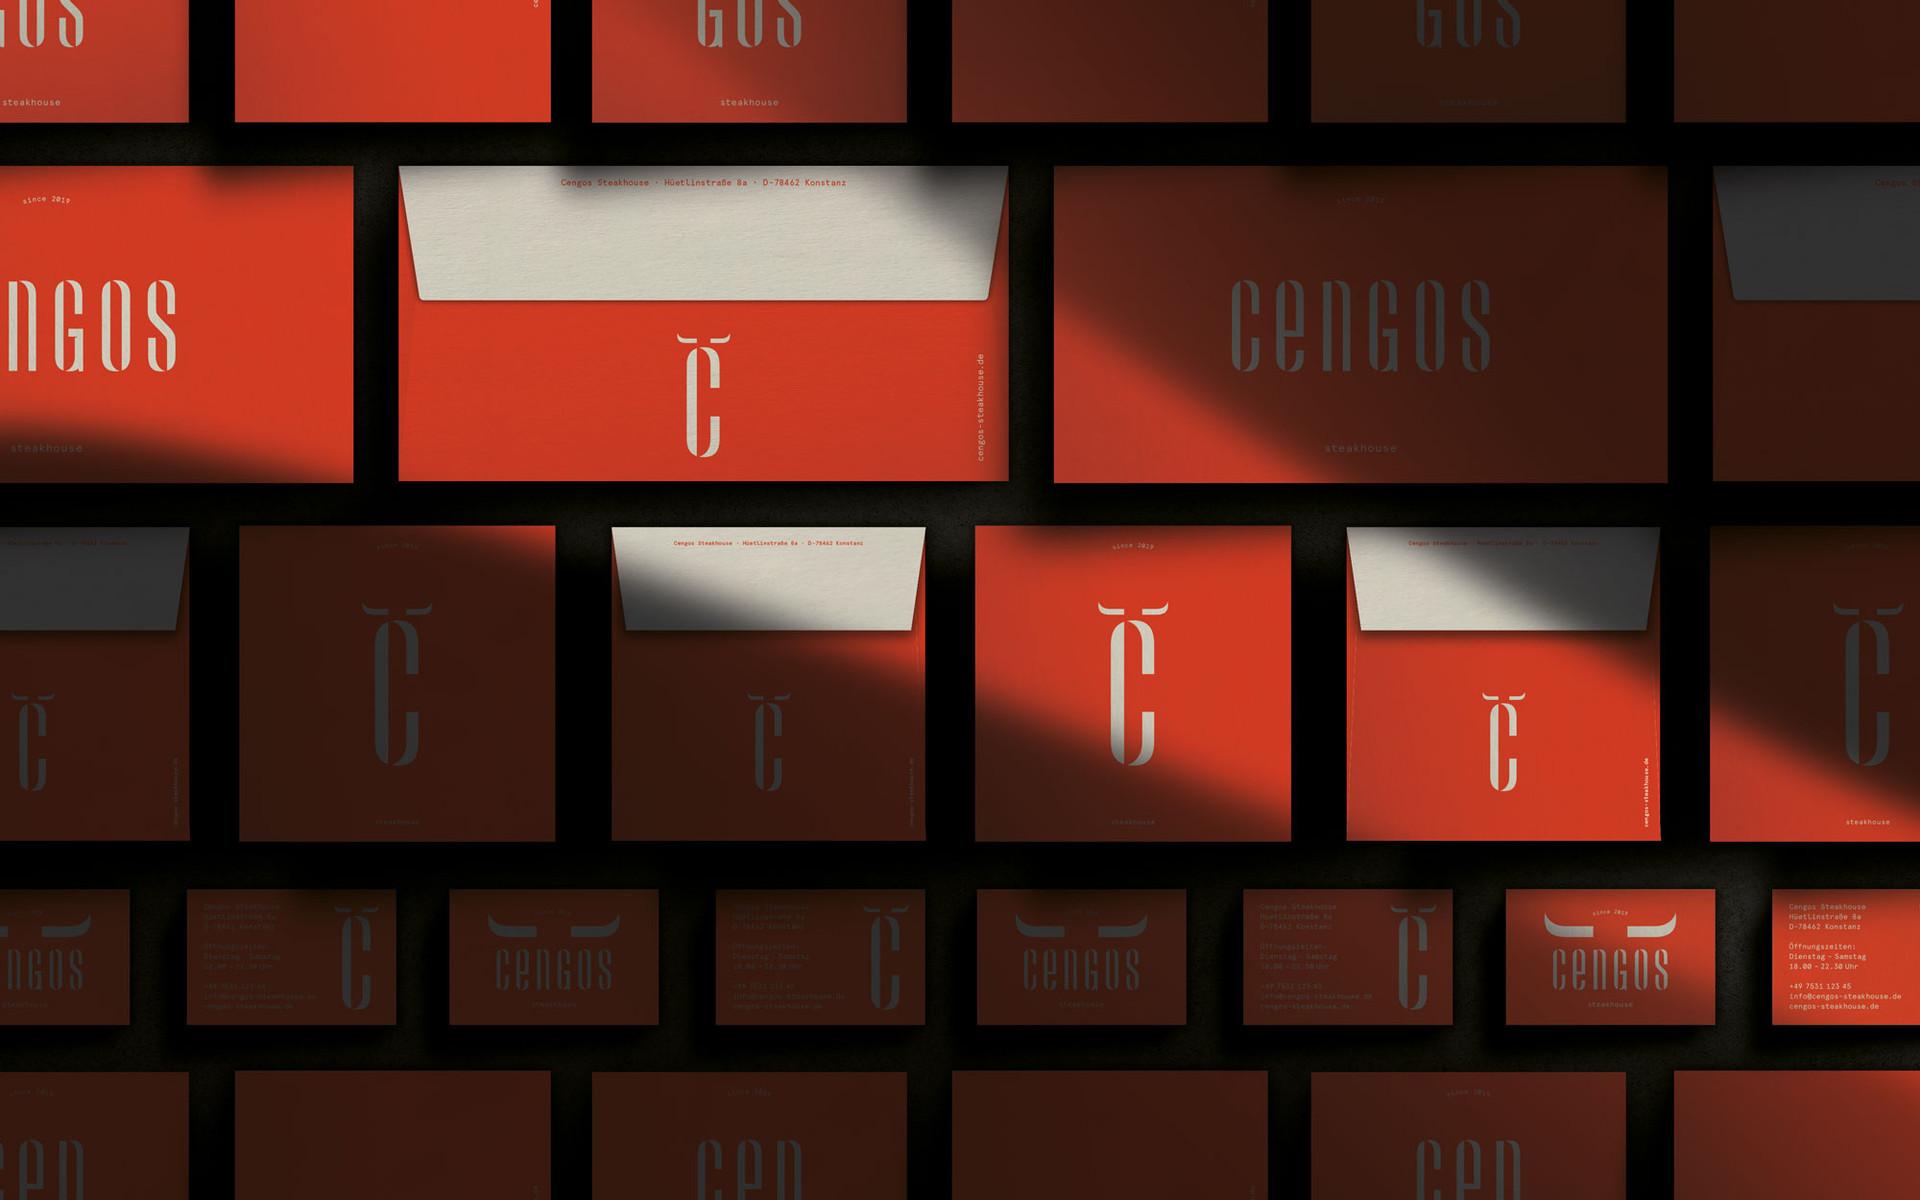 Cengos_02.jpg